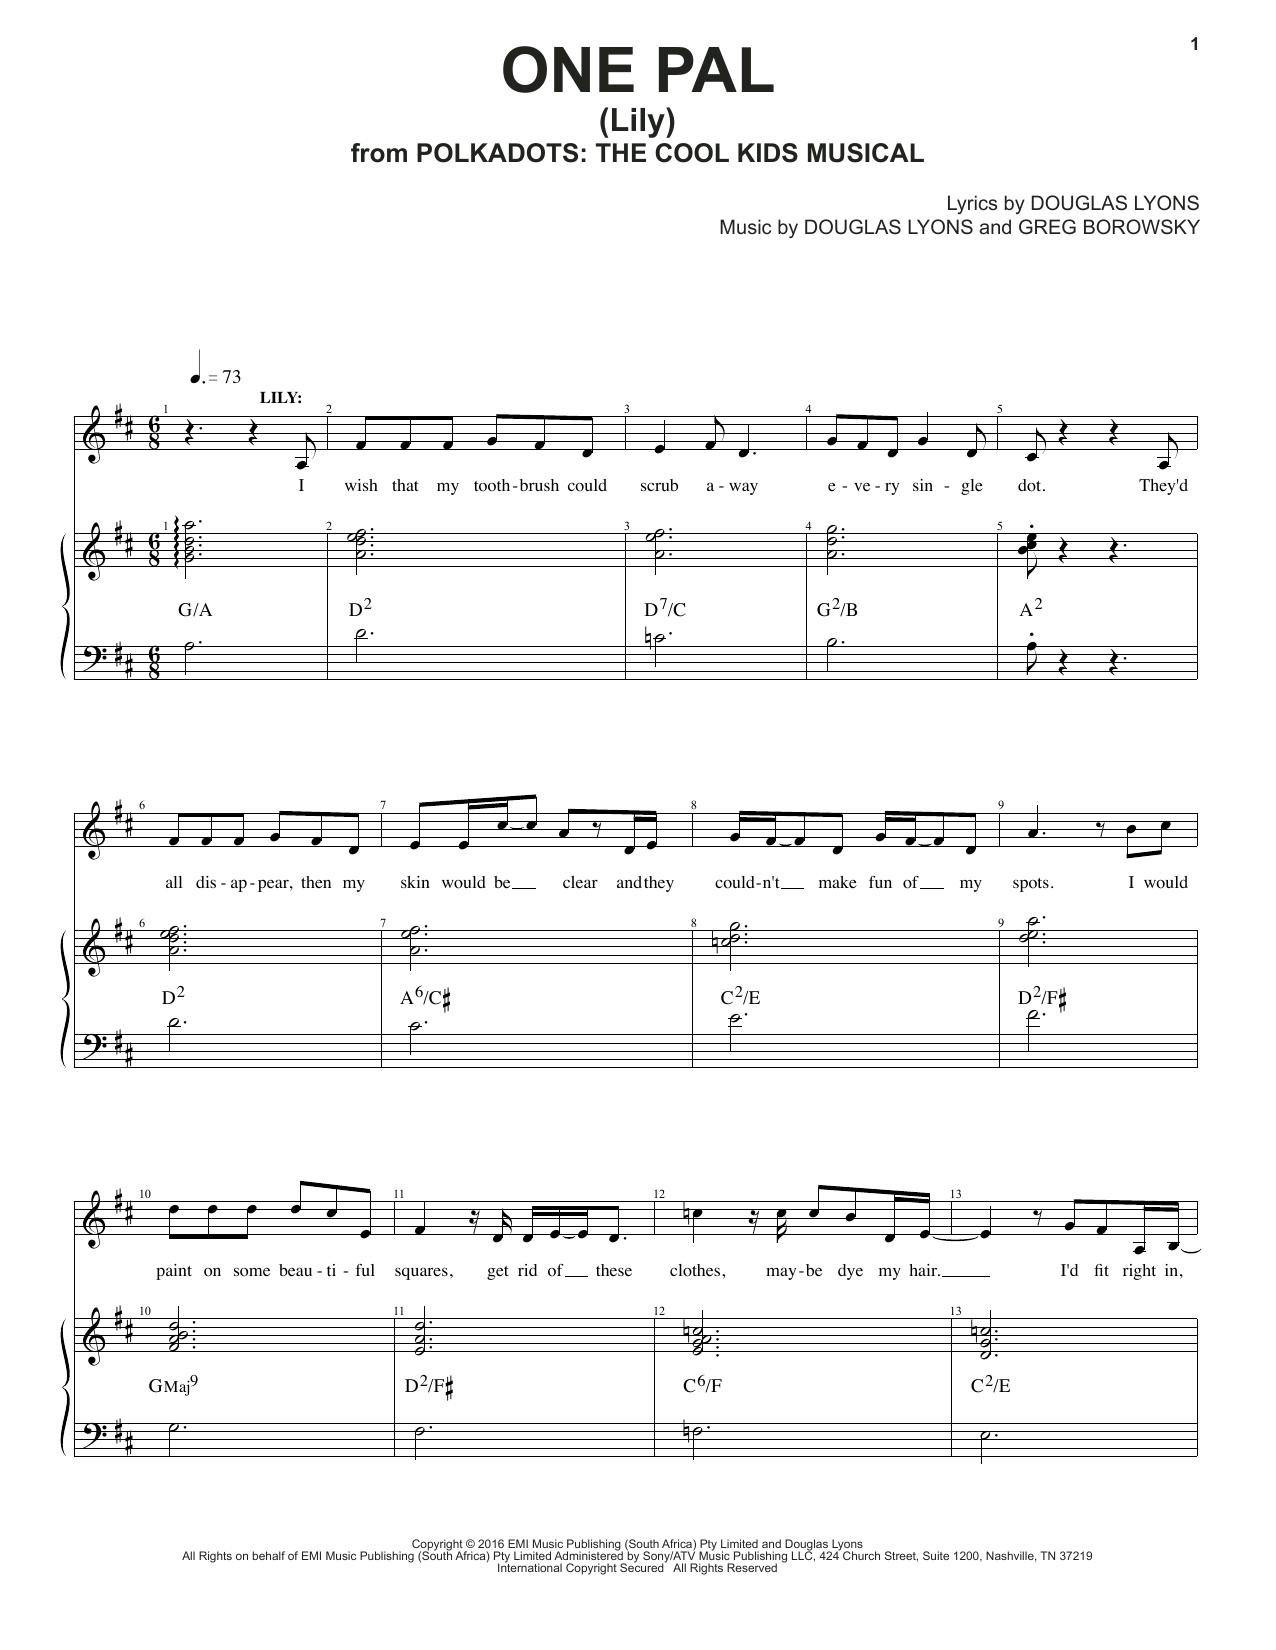 One Pal Sheet Music